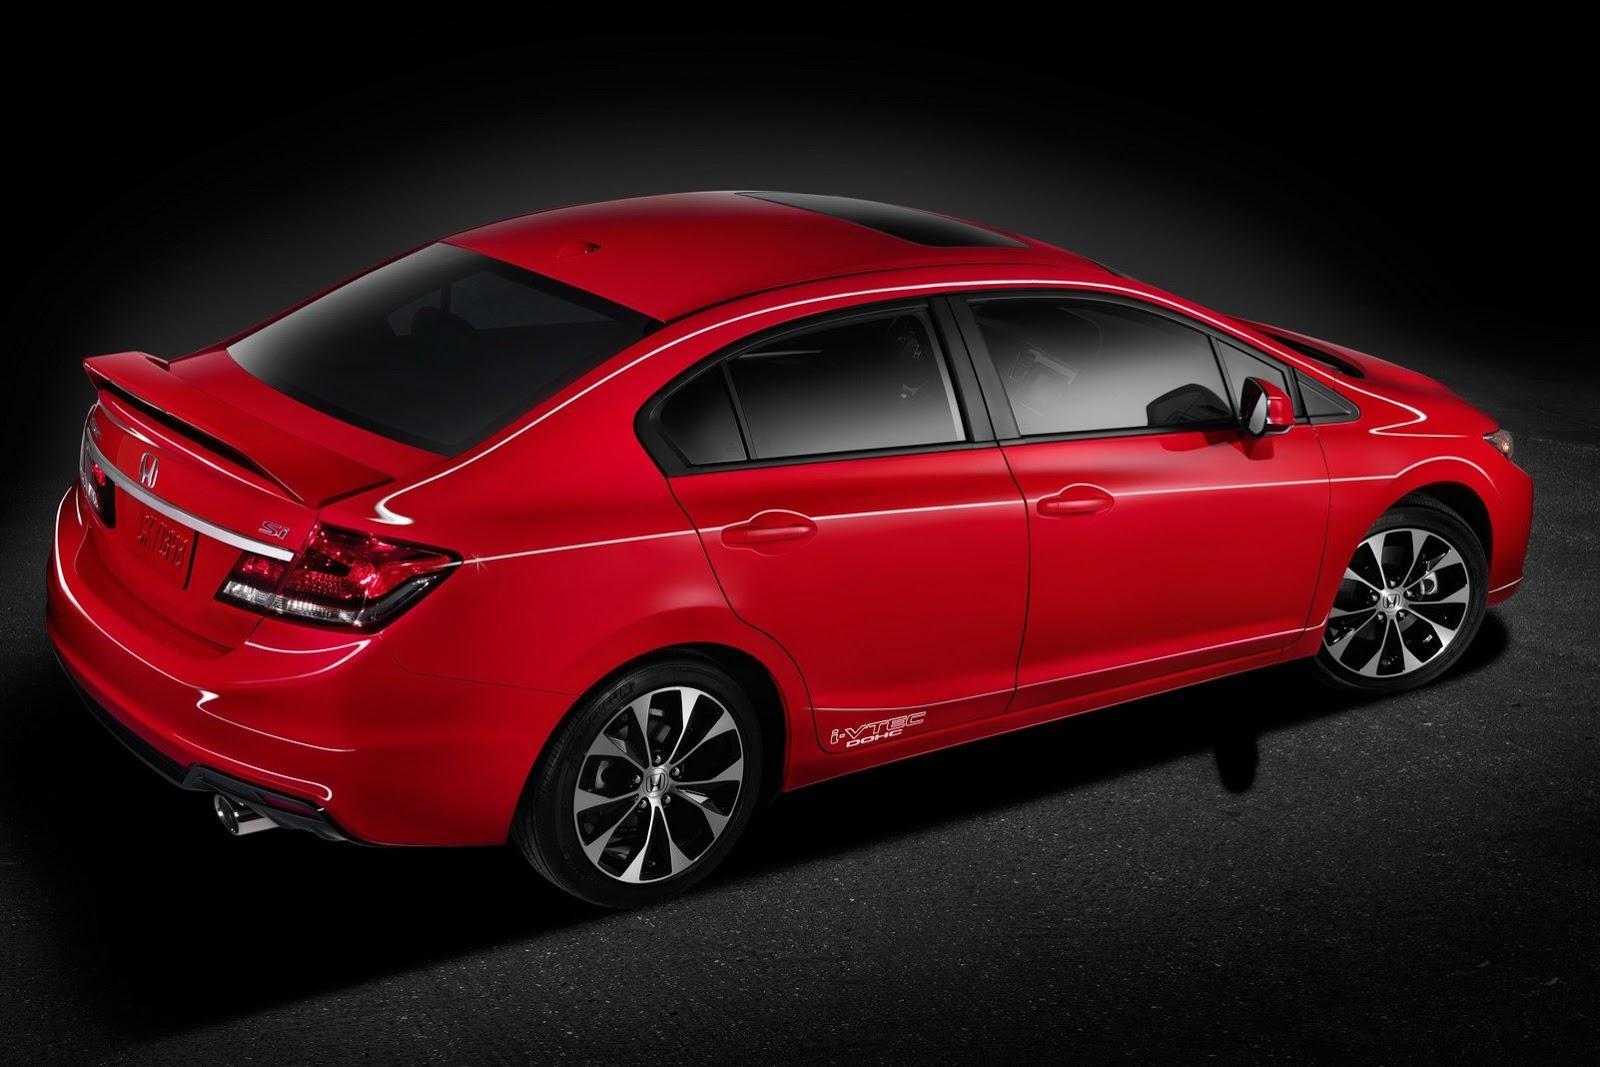 2008 Honda Civic Si Coupe 2013 Honda Civic Si Fully Detailed, Pricing Increased ...